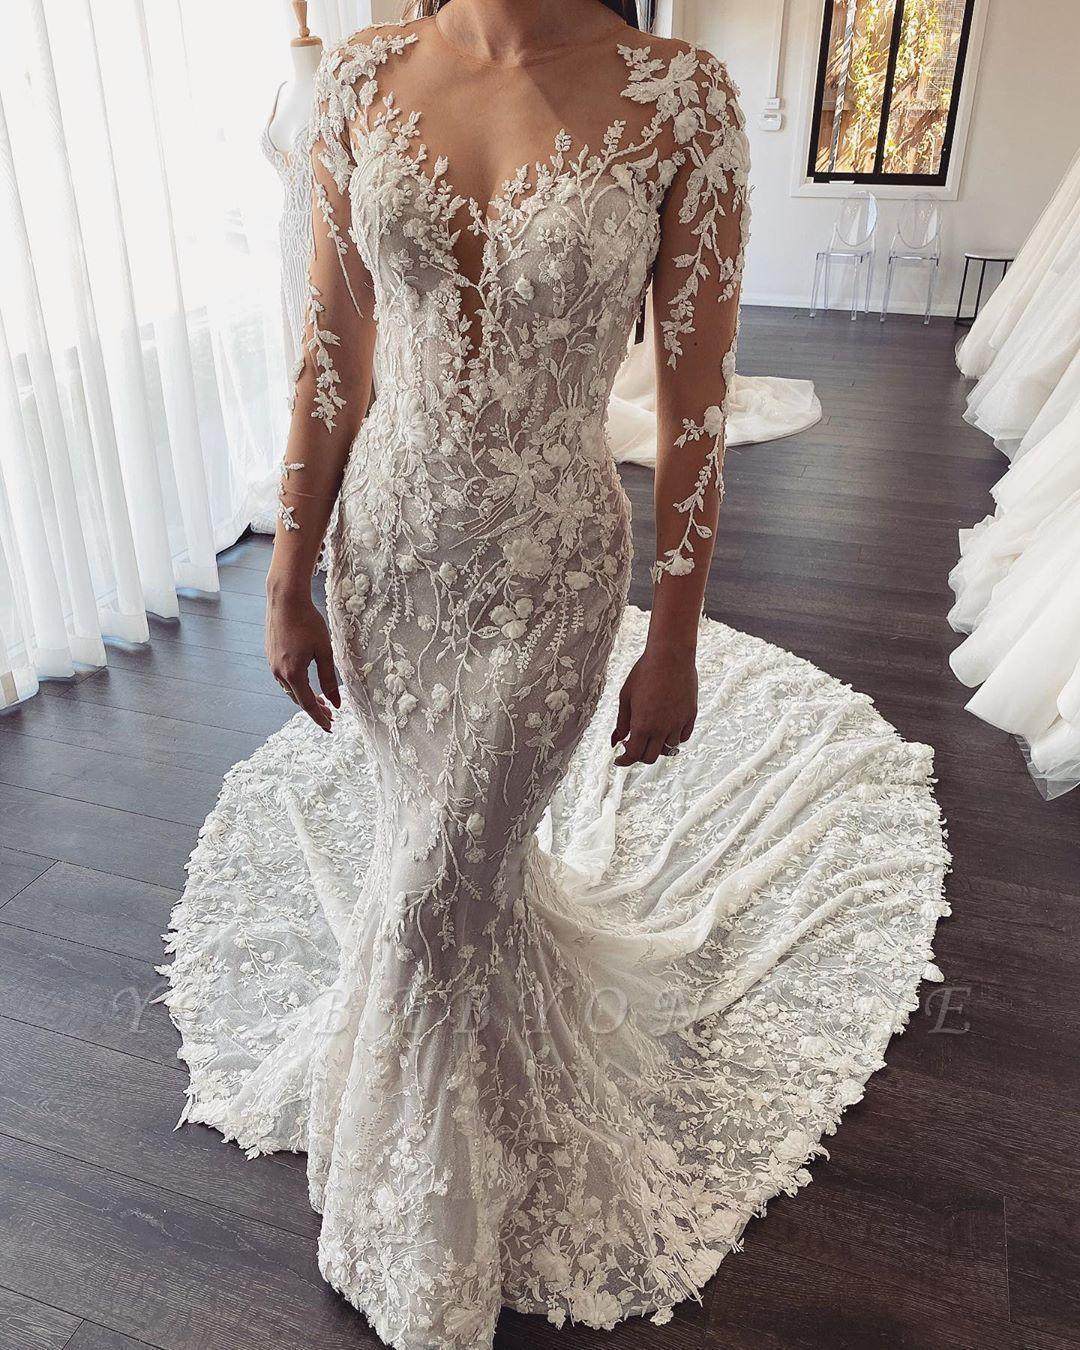 Elegant Jewel Long Sleeve Illusion Back Lace Floral Fitted Mermaid Wedding Dresses Wedding Dresses Lace Online Wedding Dress Designer Wedding Dresses [ 1350 x 1080 Pixel ]